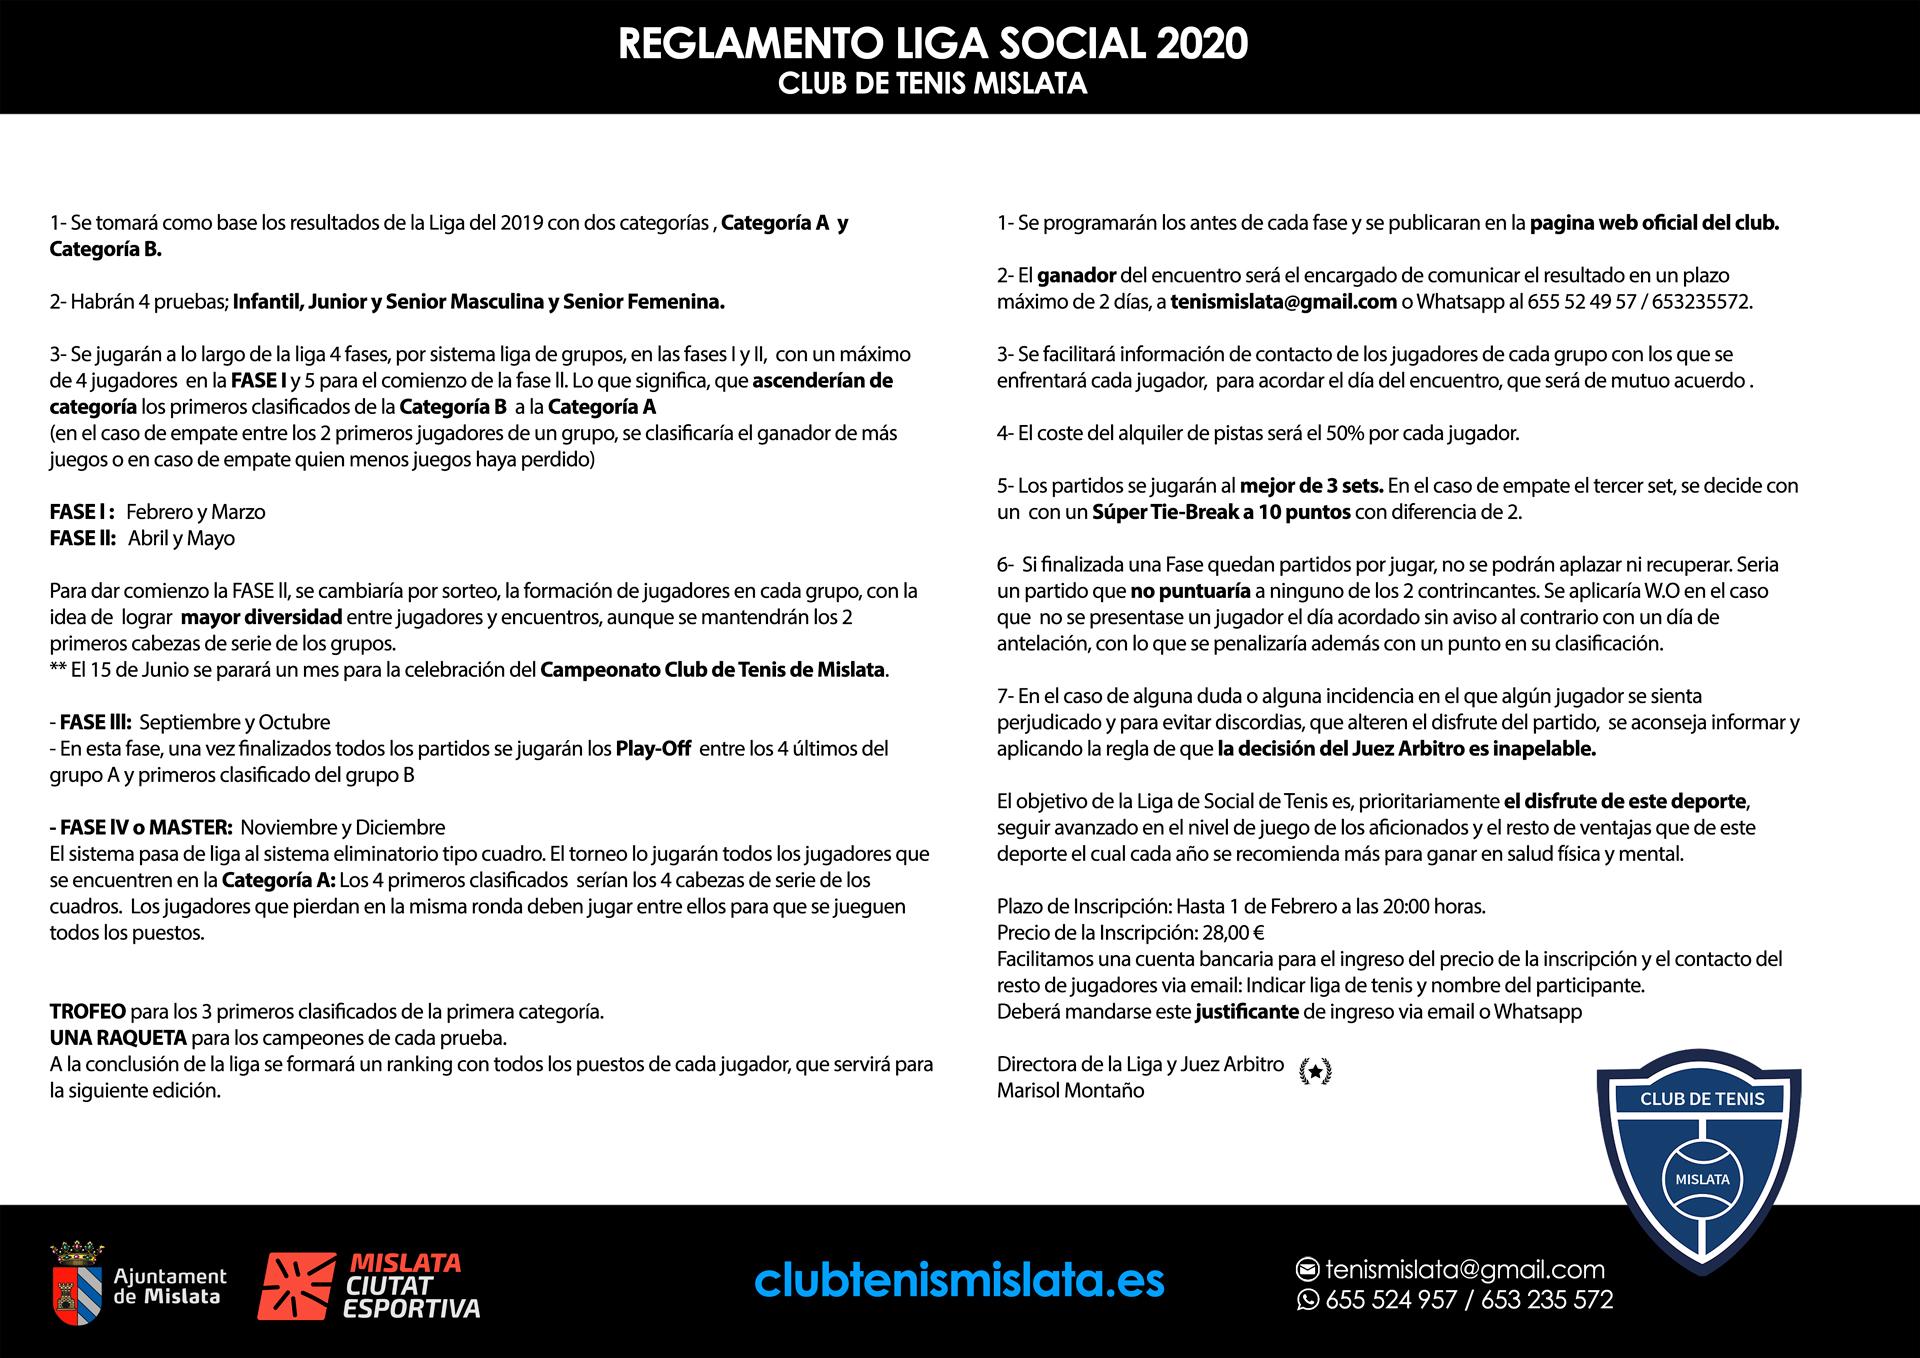 Liga Social Club de Tenis Mislata